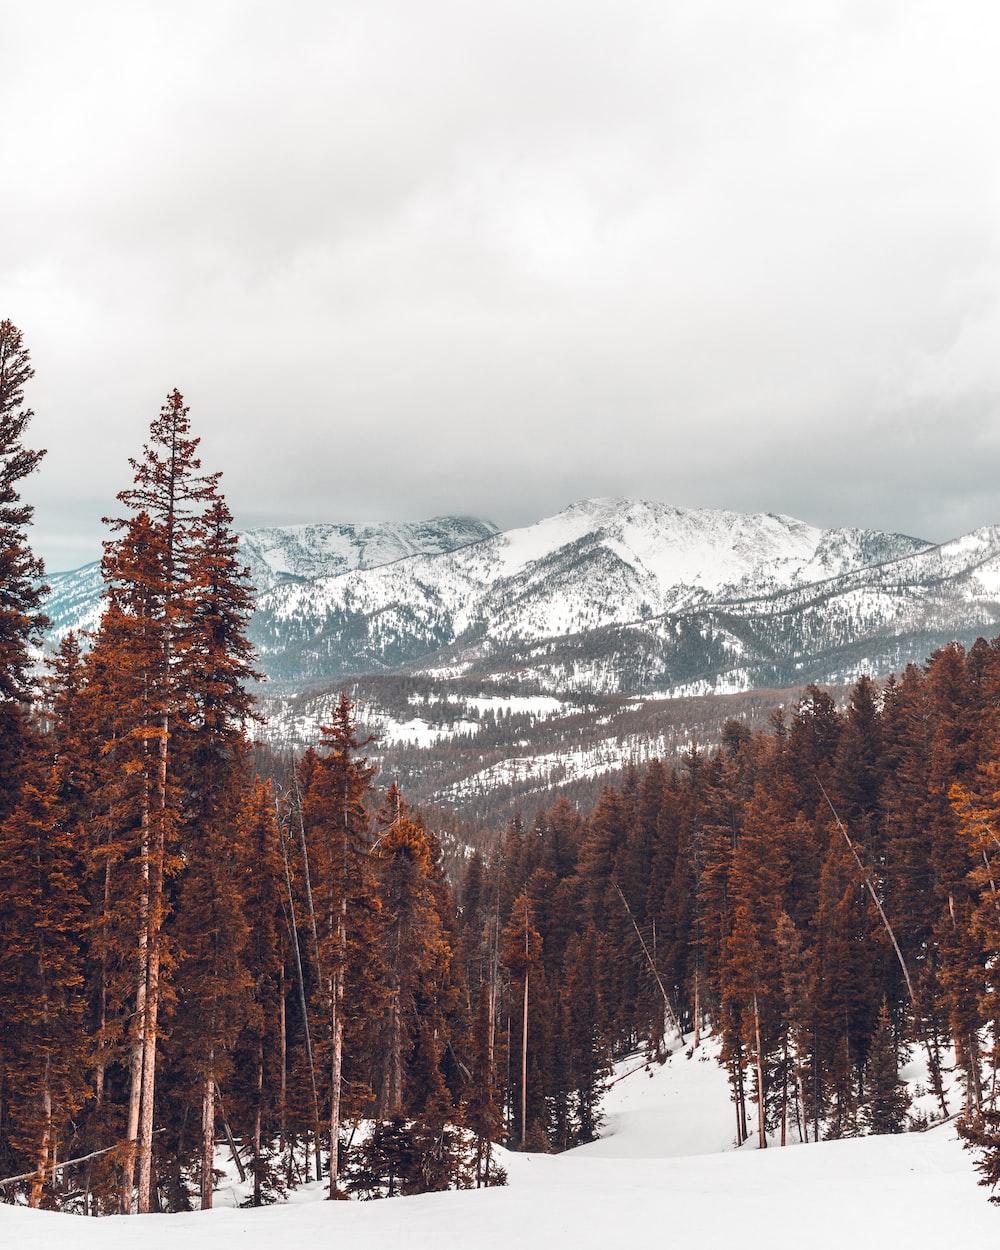 landscape photo of pine tree